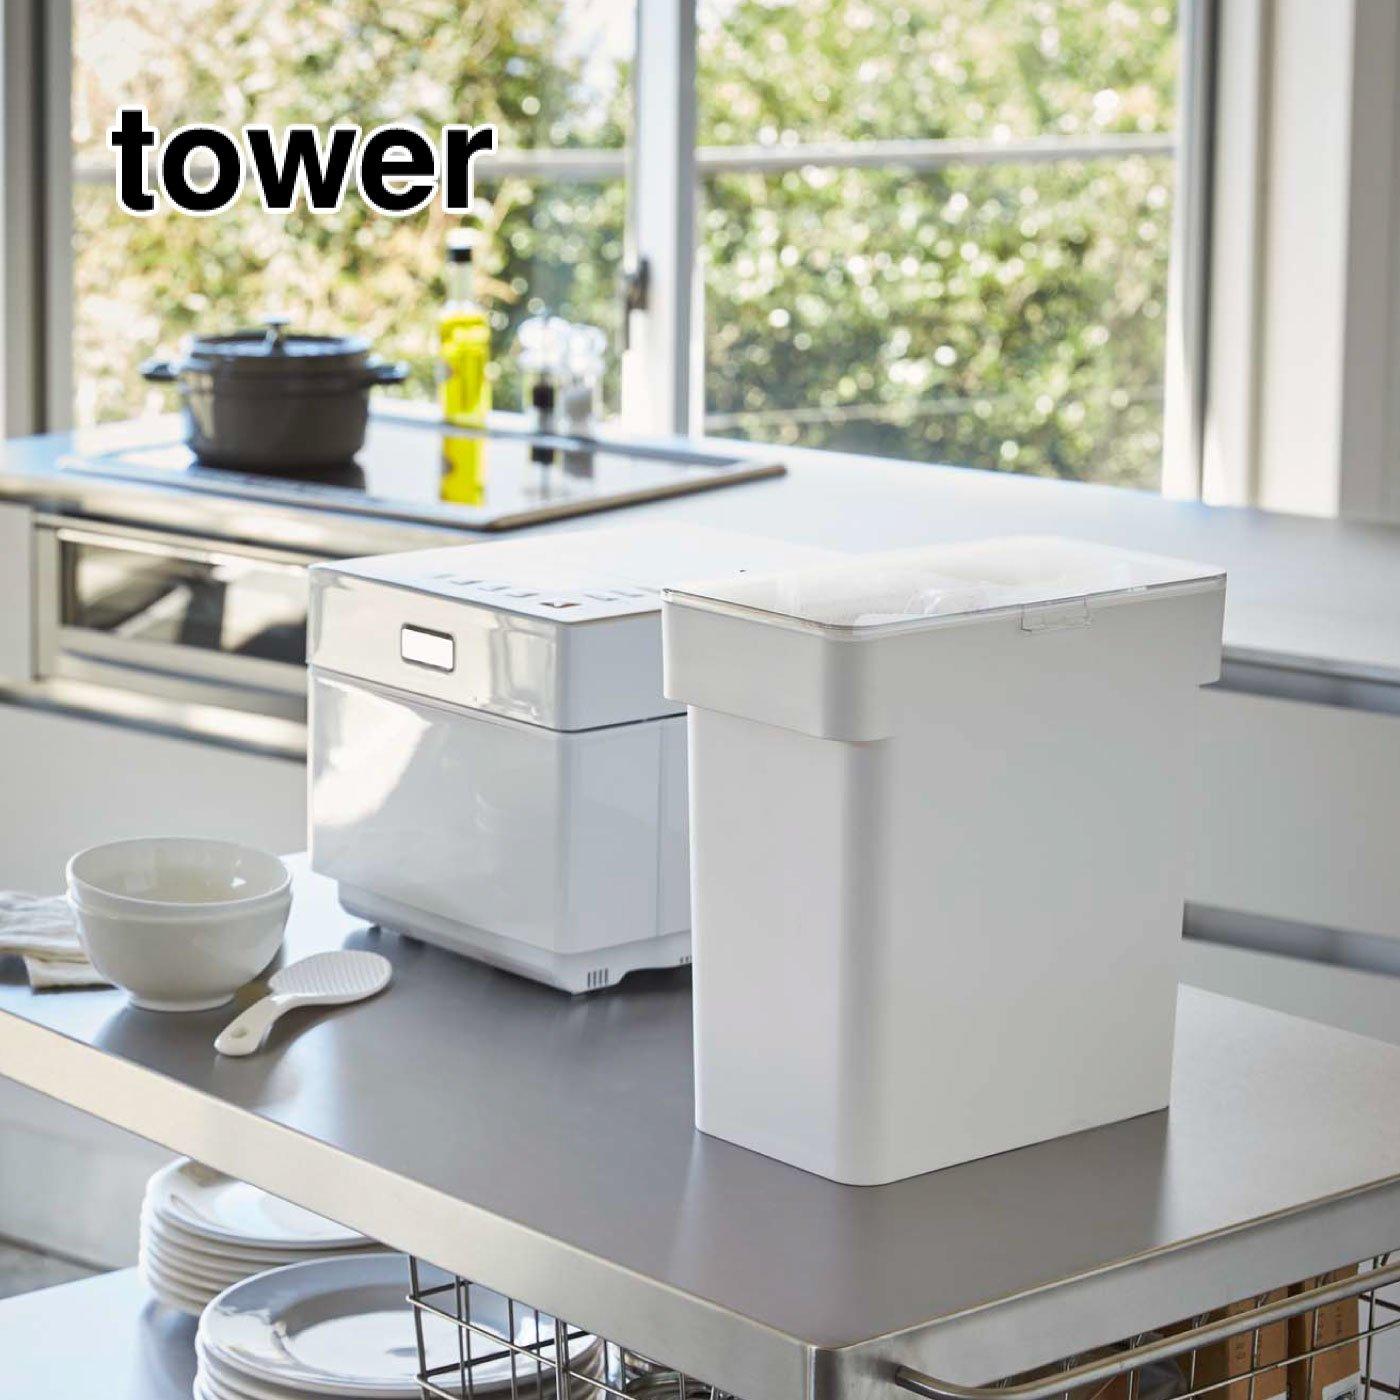 tower 米びつ 密閉5㎏  計量カップ付き